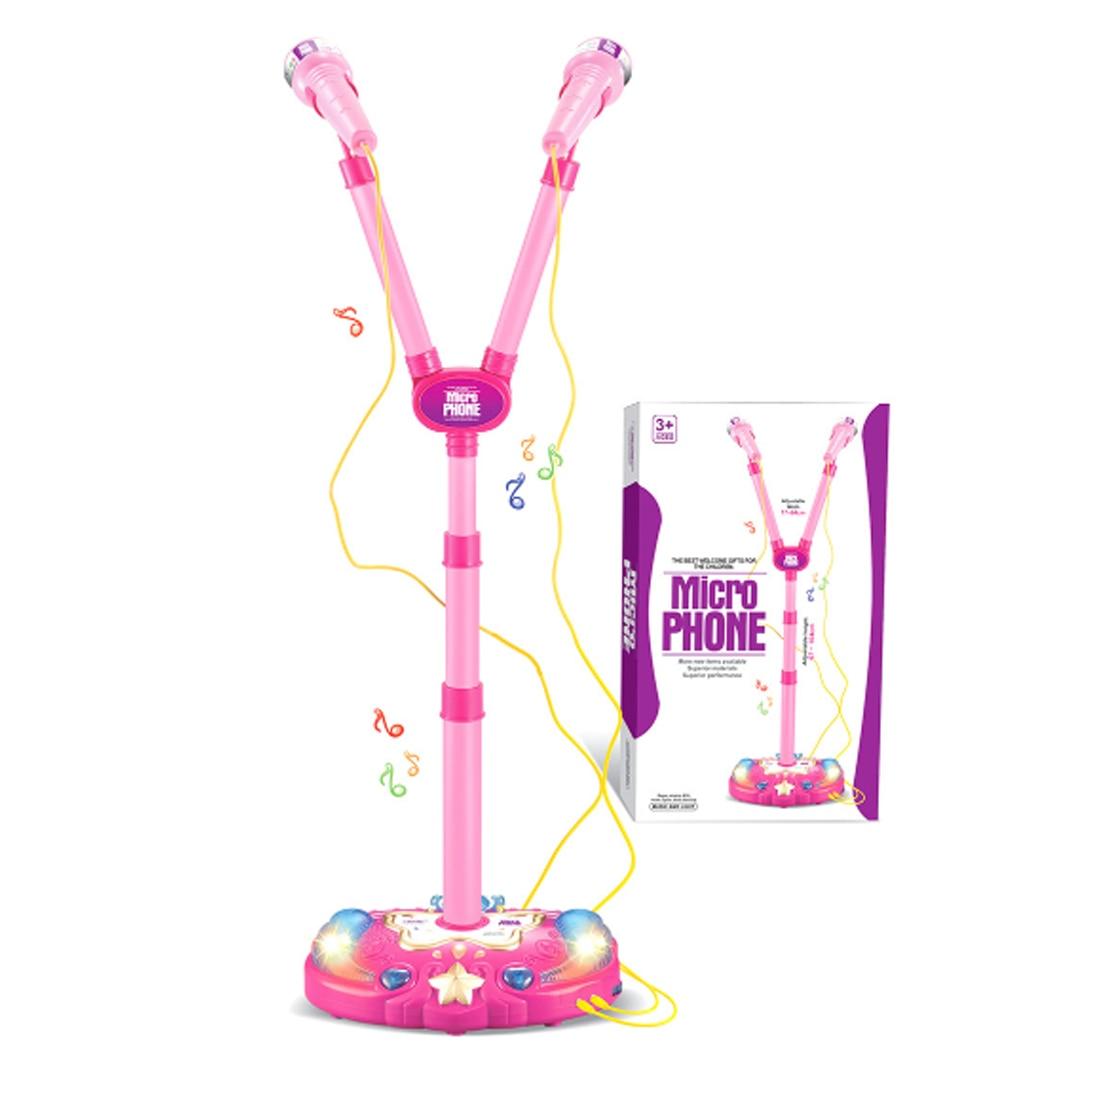 Children Vertical Type Adjustable Karaoke Machine Toys Two-mike Light for Singing Brainging Musical Instrument Toys for Kids